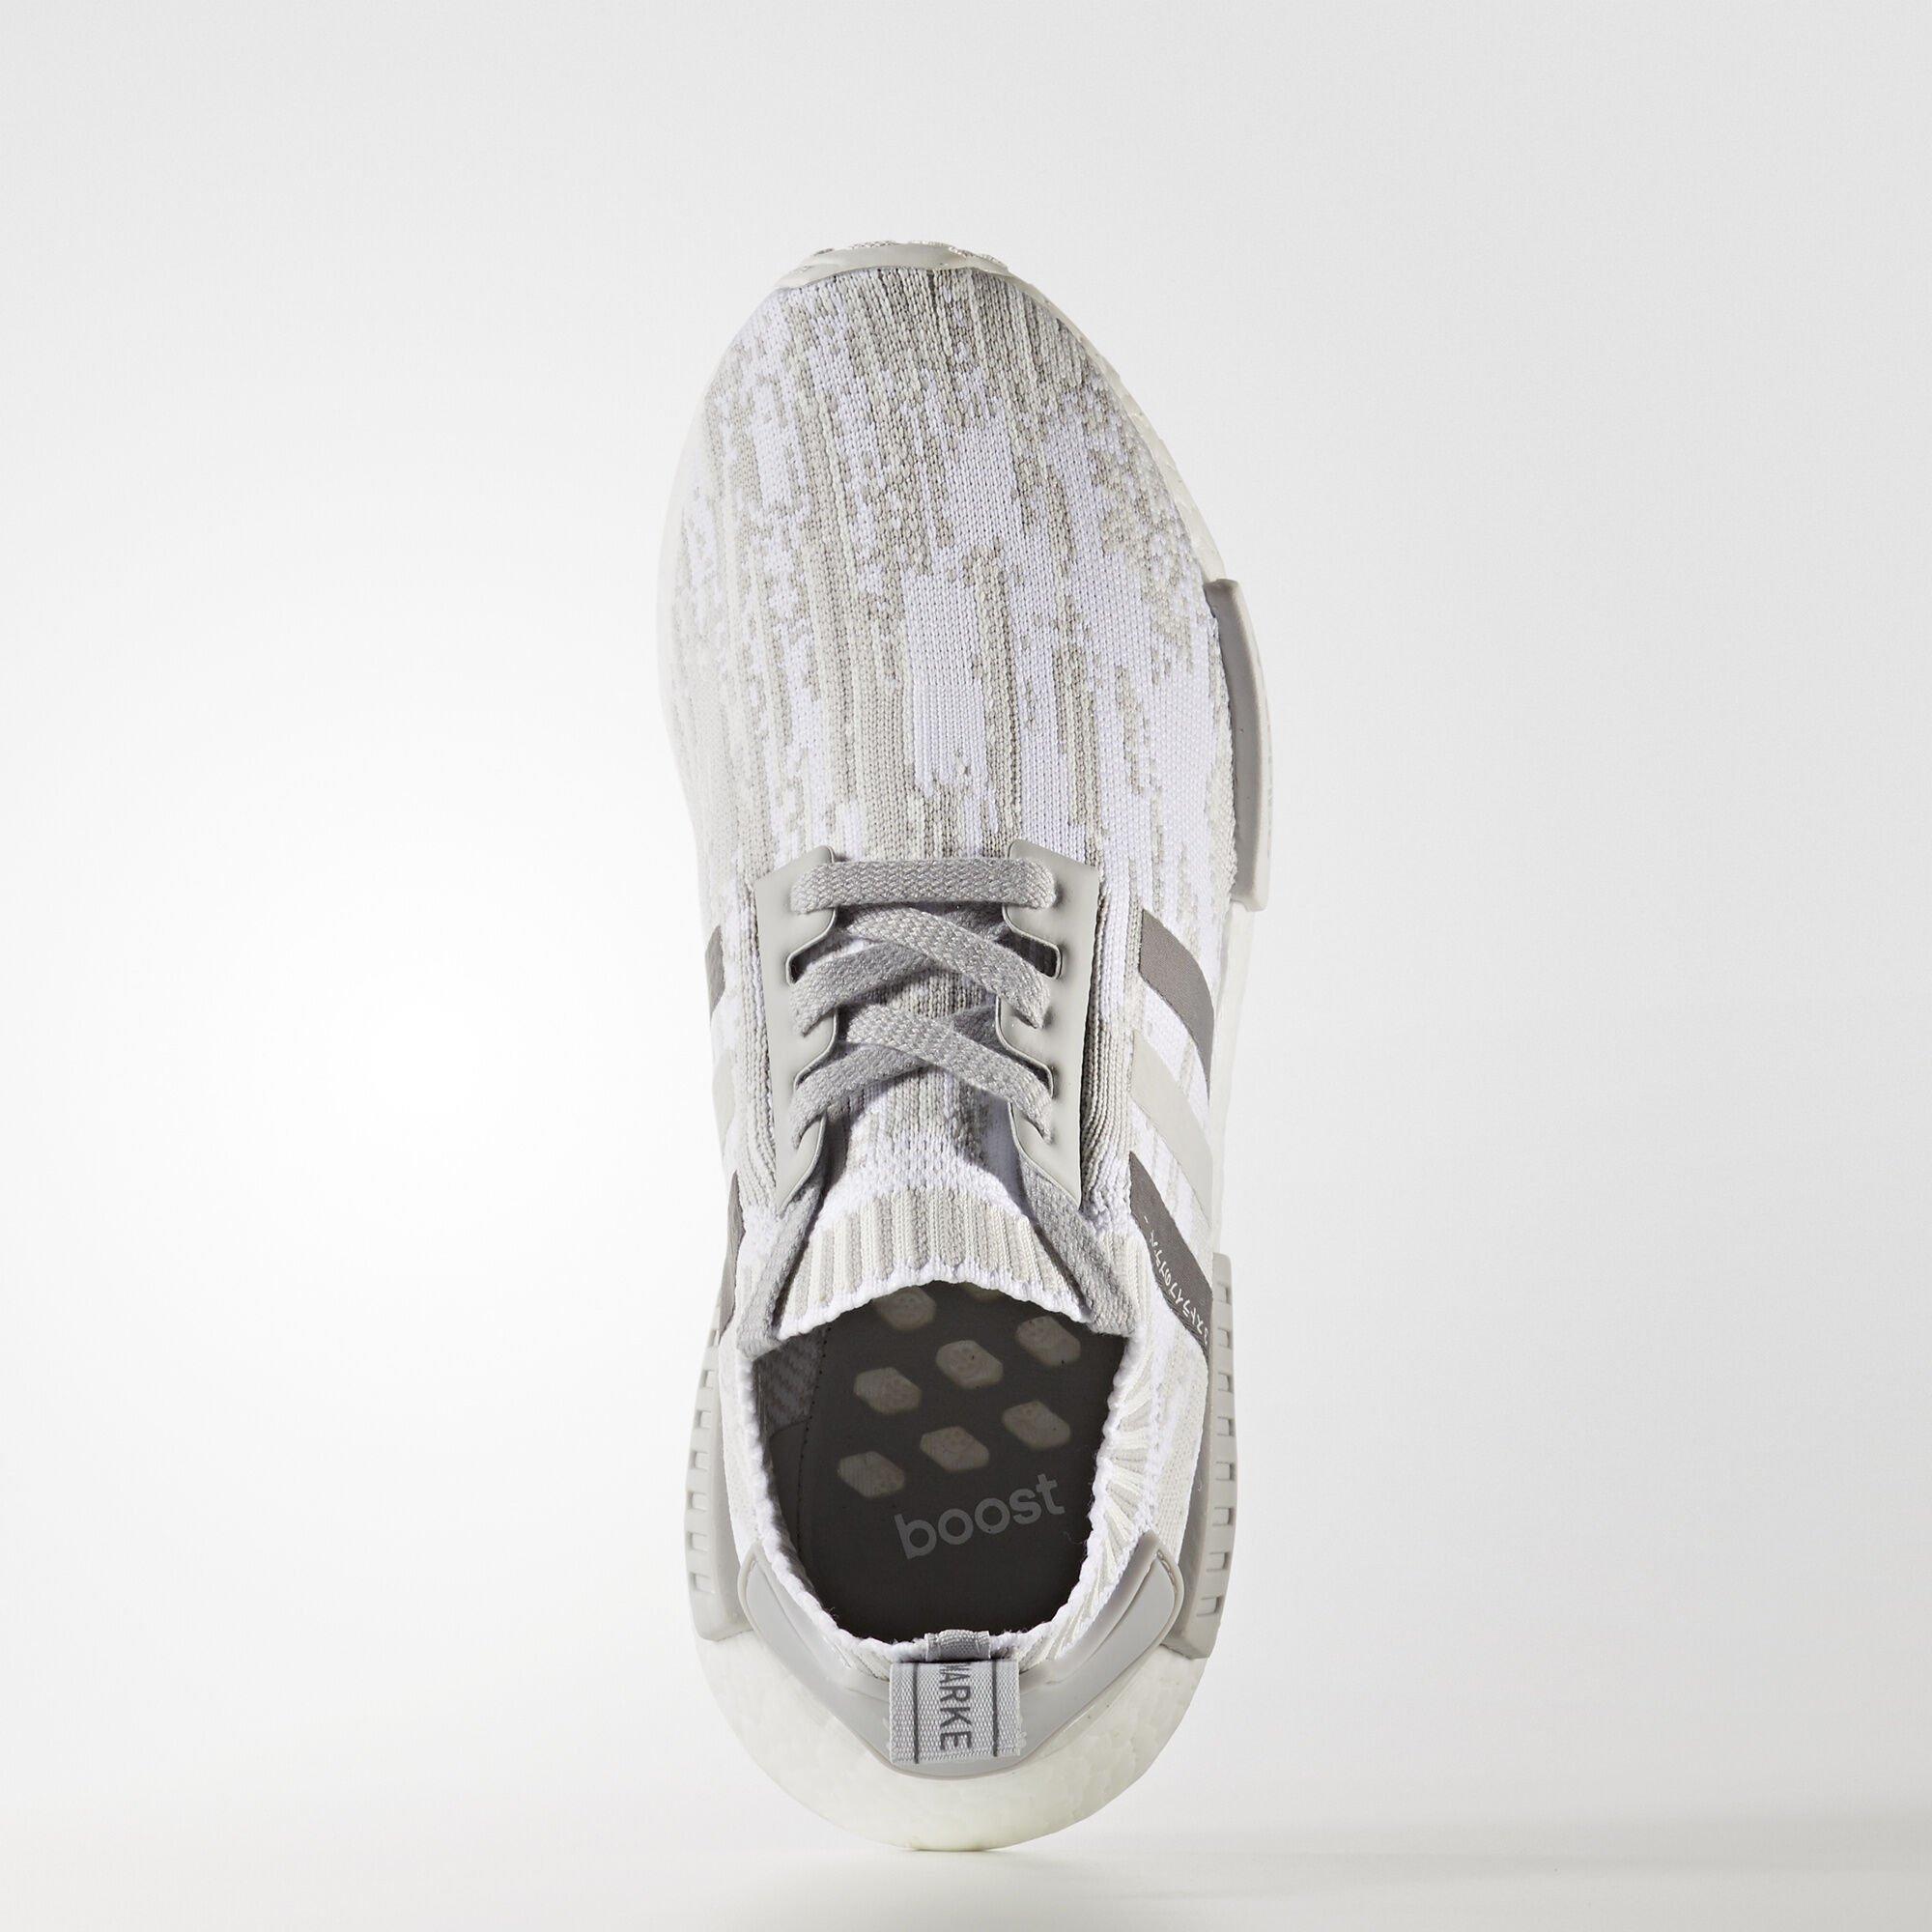 adidas NMD R1 Glitch Camo Grey (W) (BY9865)